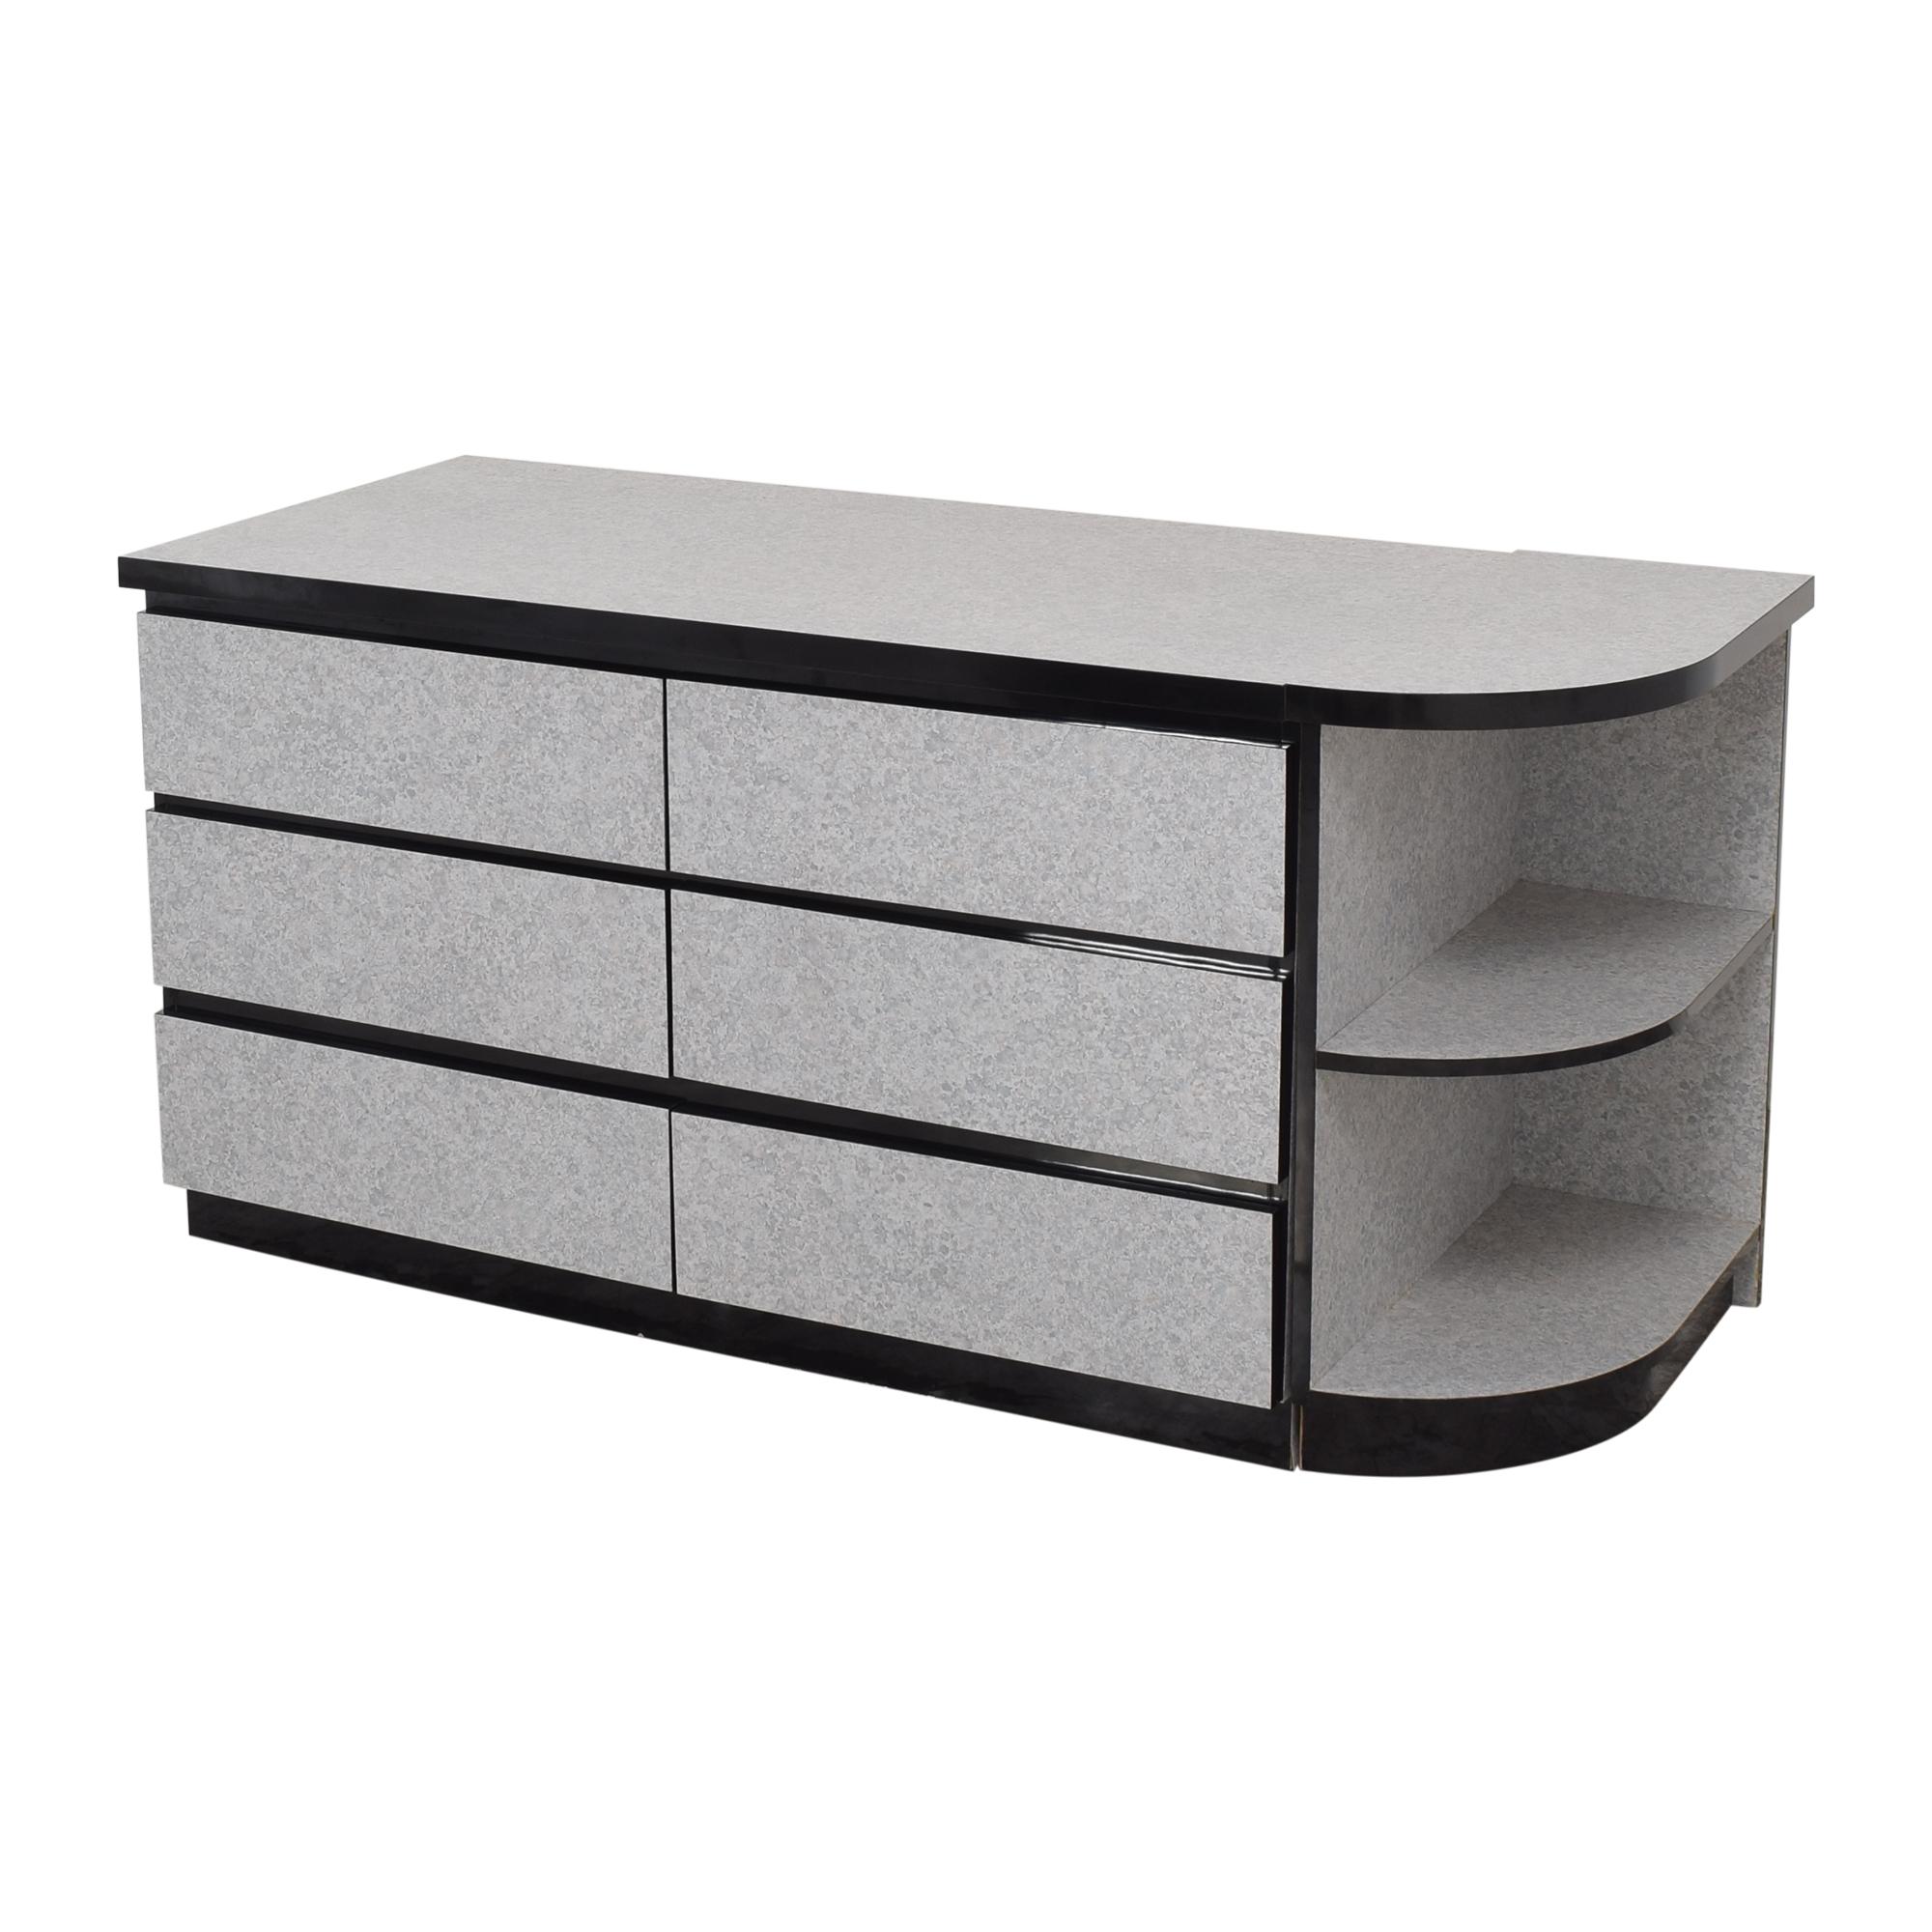 American Woodcrafters American Woodcrafters Six Drawer Dresser with Side Shelf Storage